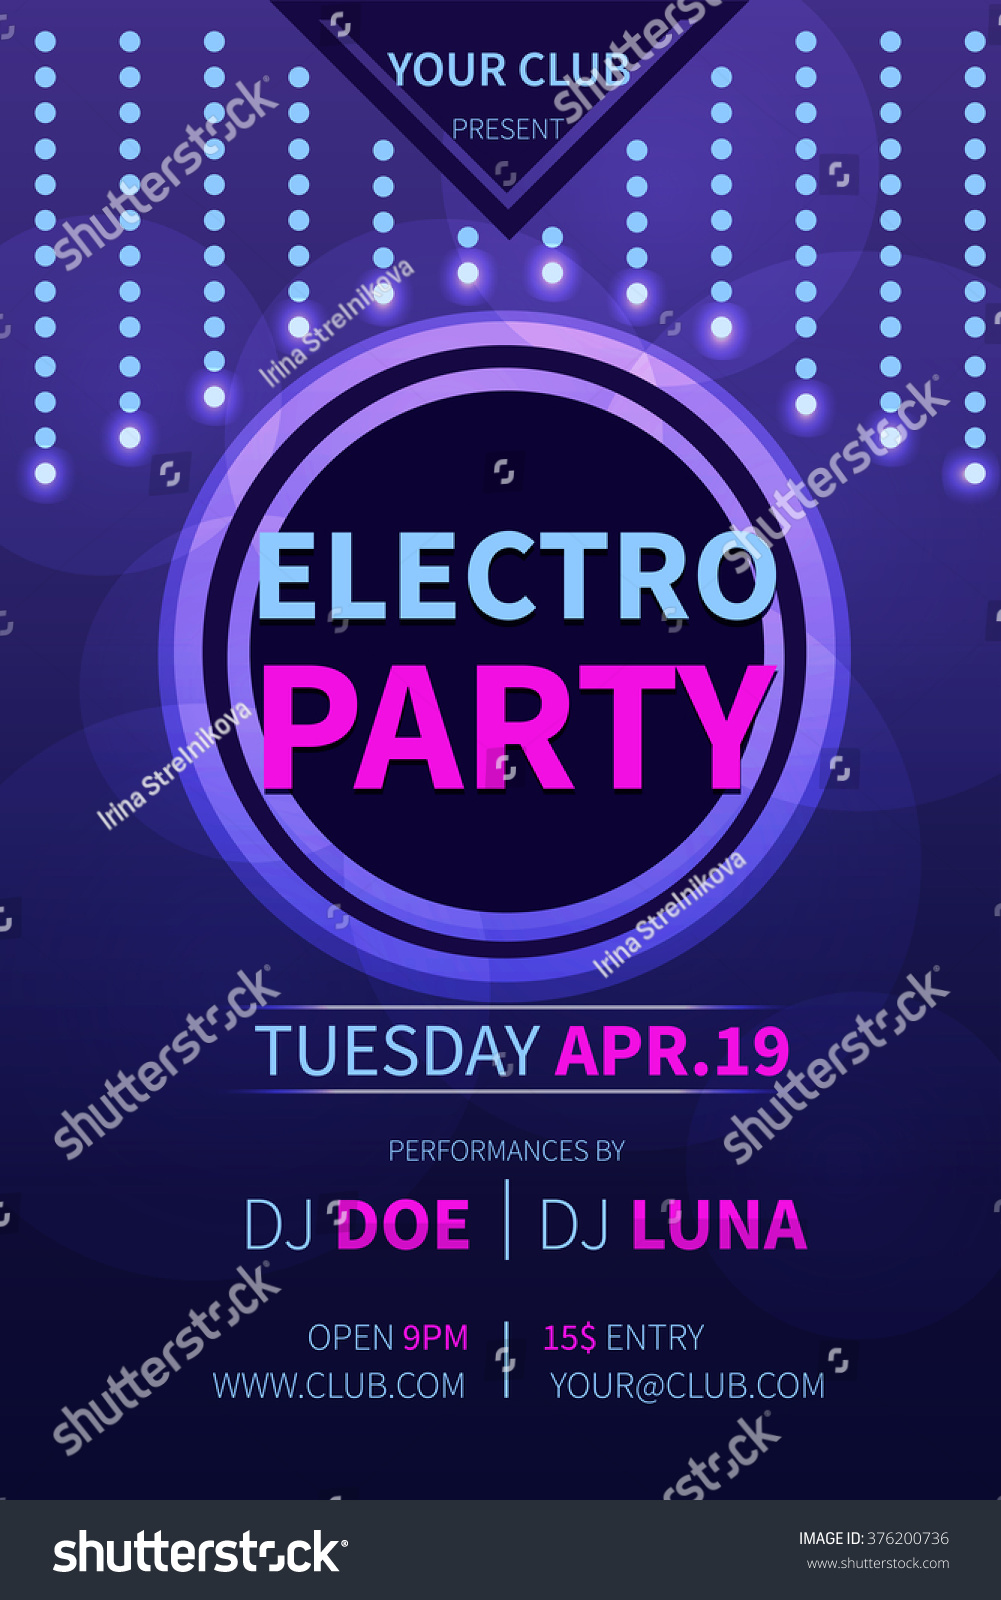 Vector Electro Party Flyer Template Abstract Stock Vector Royalty